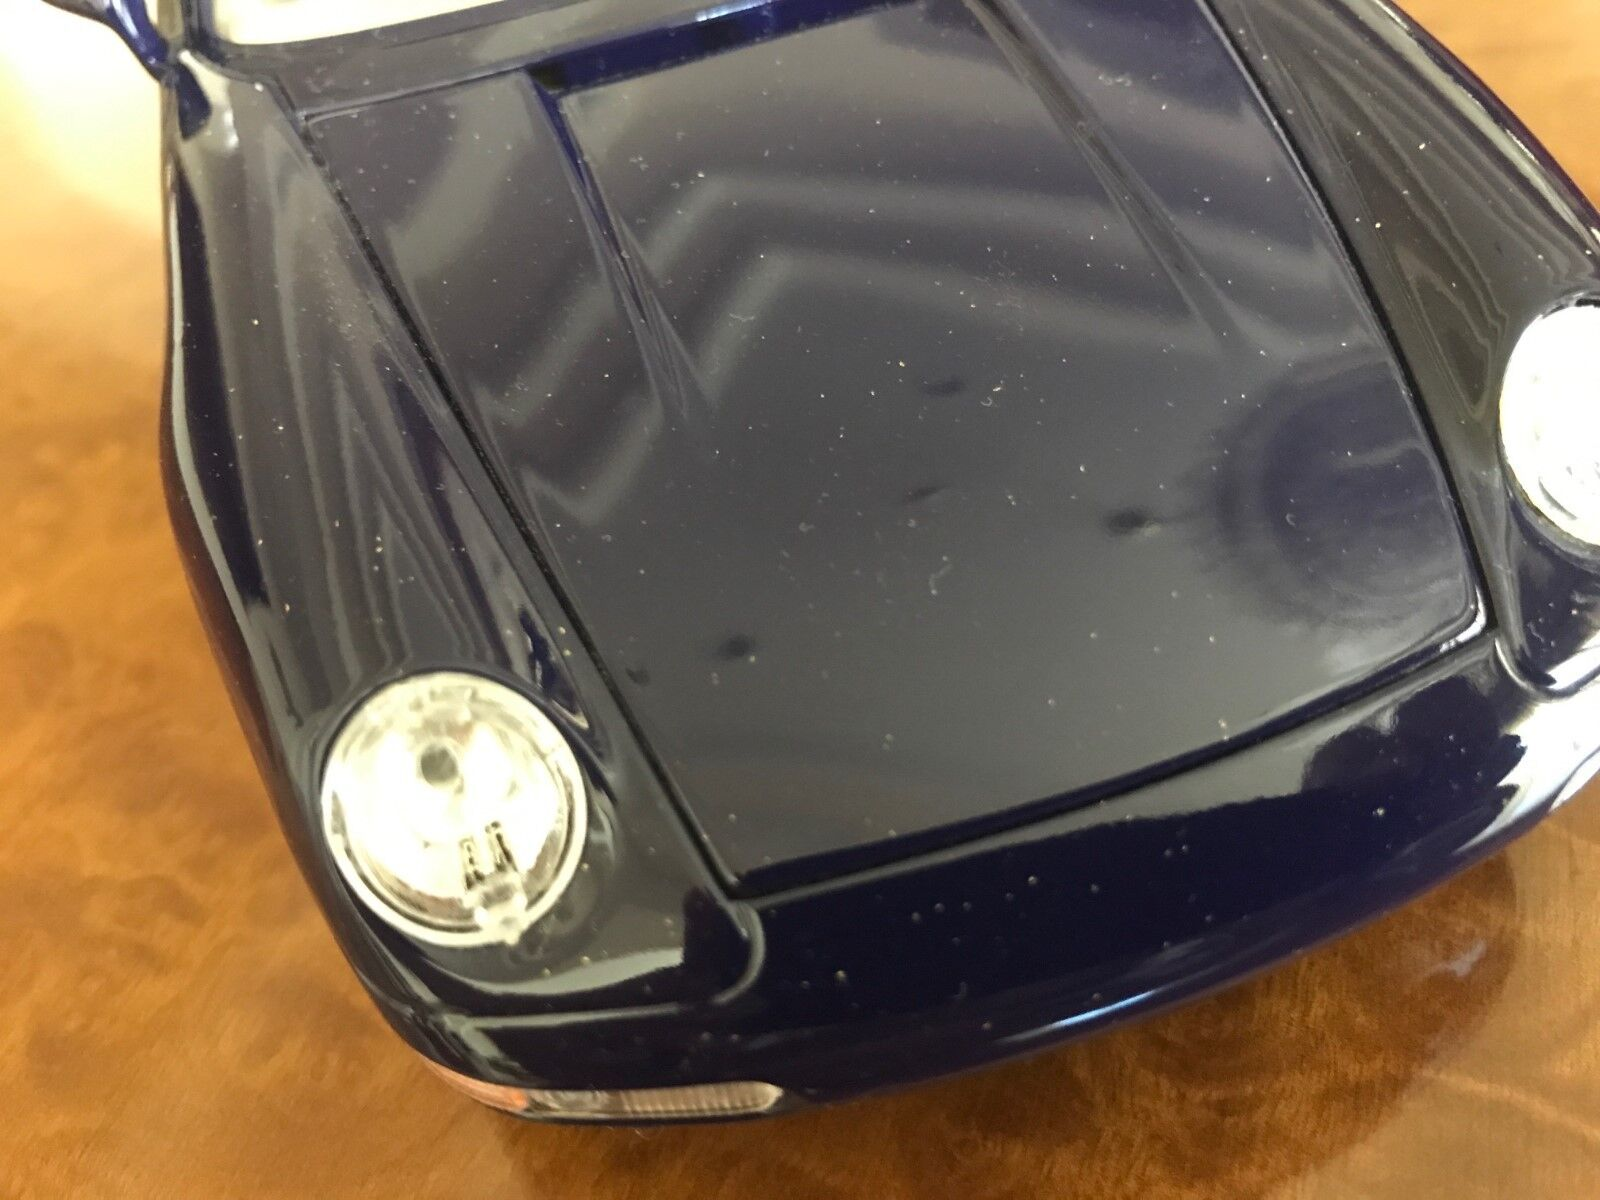 Standox   1 18 Porsche Porsche Porsche 911 Carrera S   Lapis Lbluei w  24 KT gold Flakes 8e1855